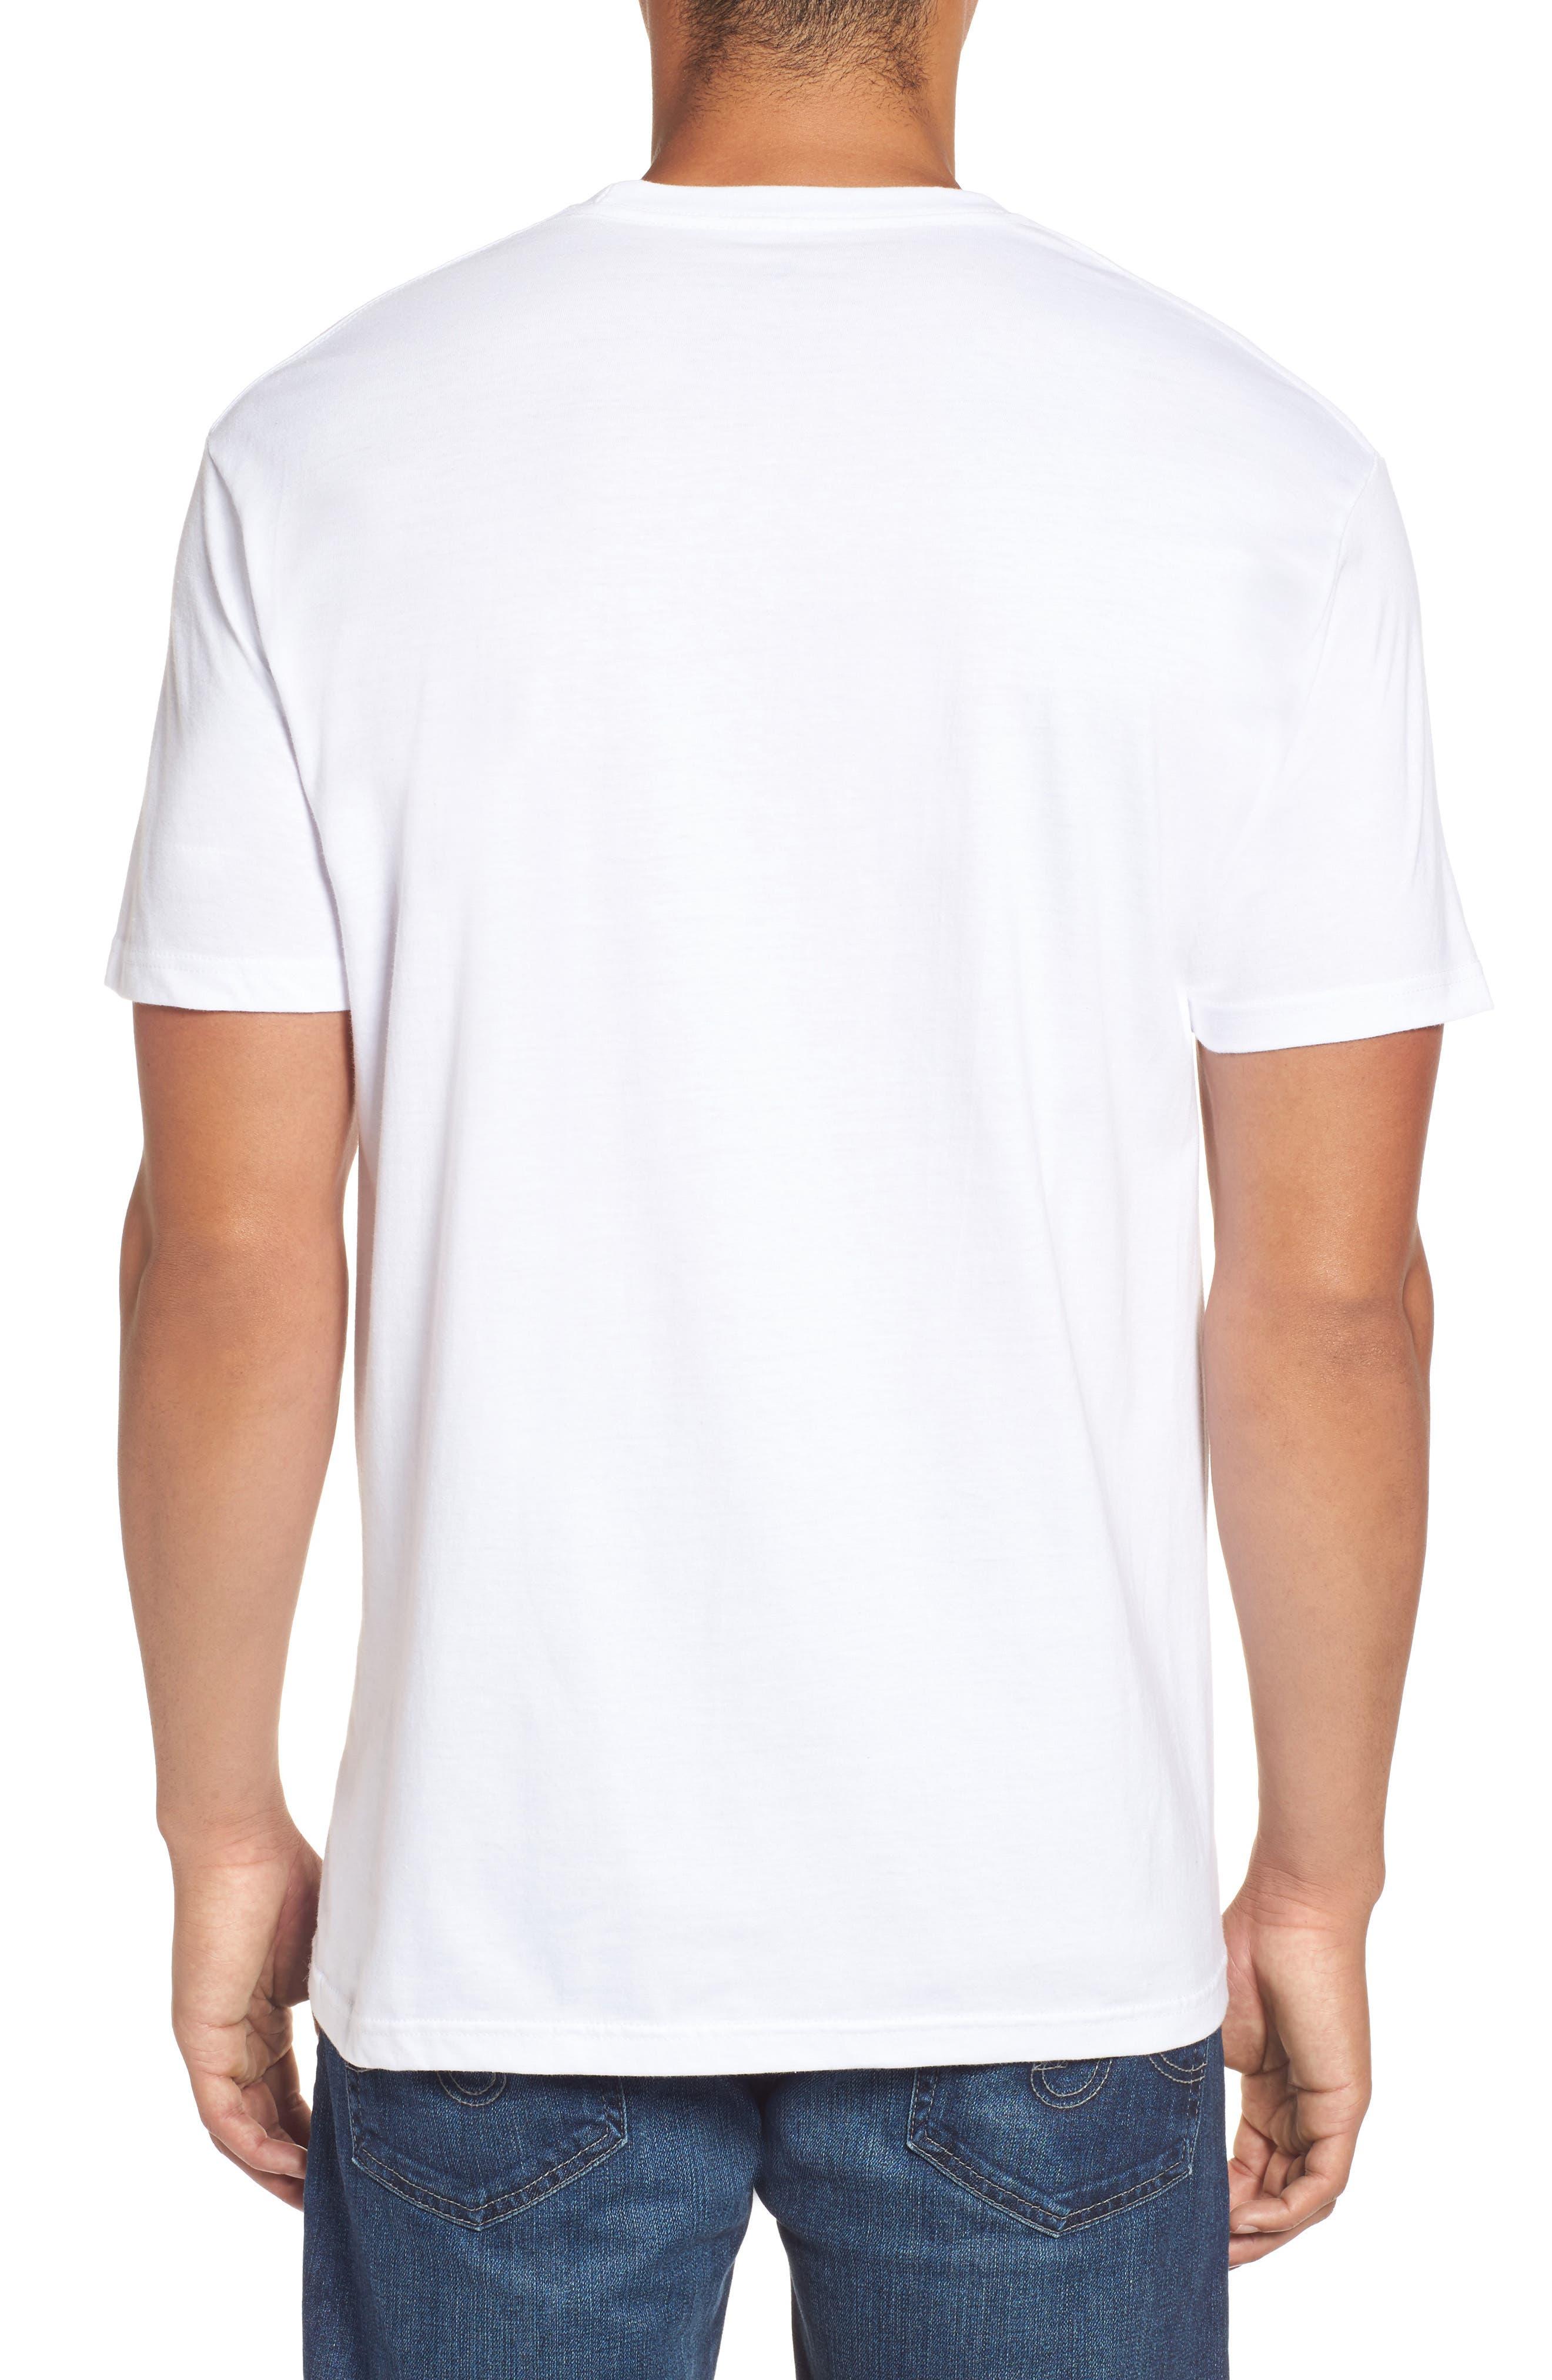 Racks Premium Graphic T-Shirt,                             Alternate thumbnail 2, color,                             White